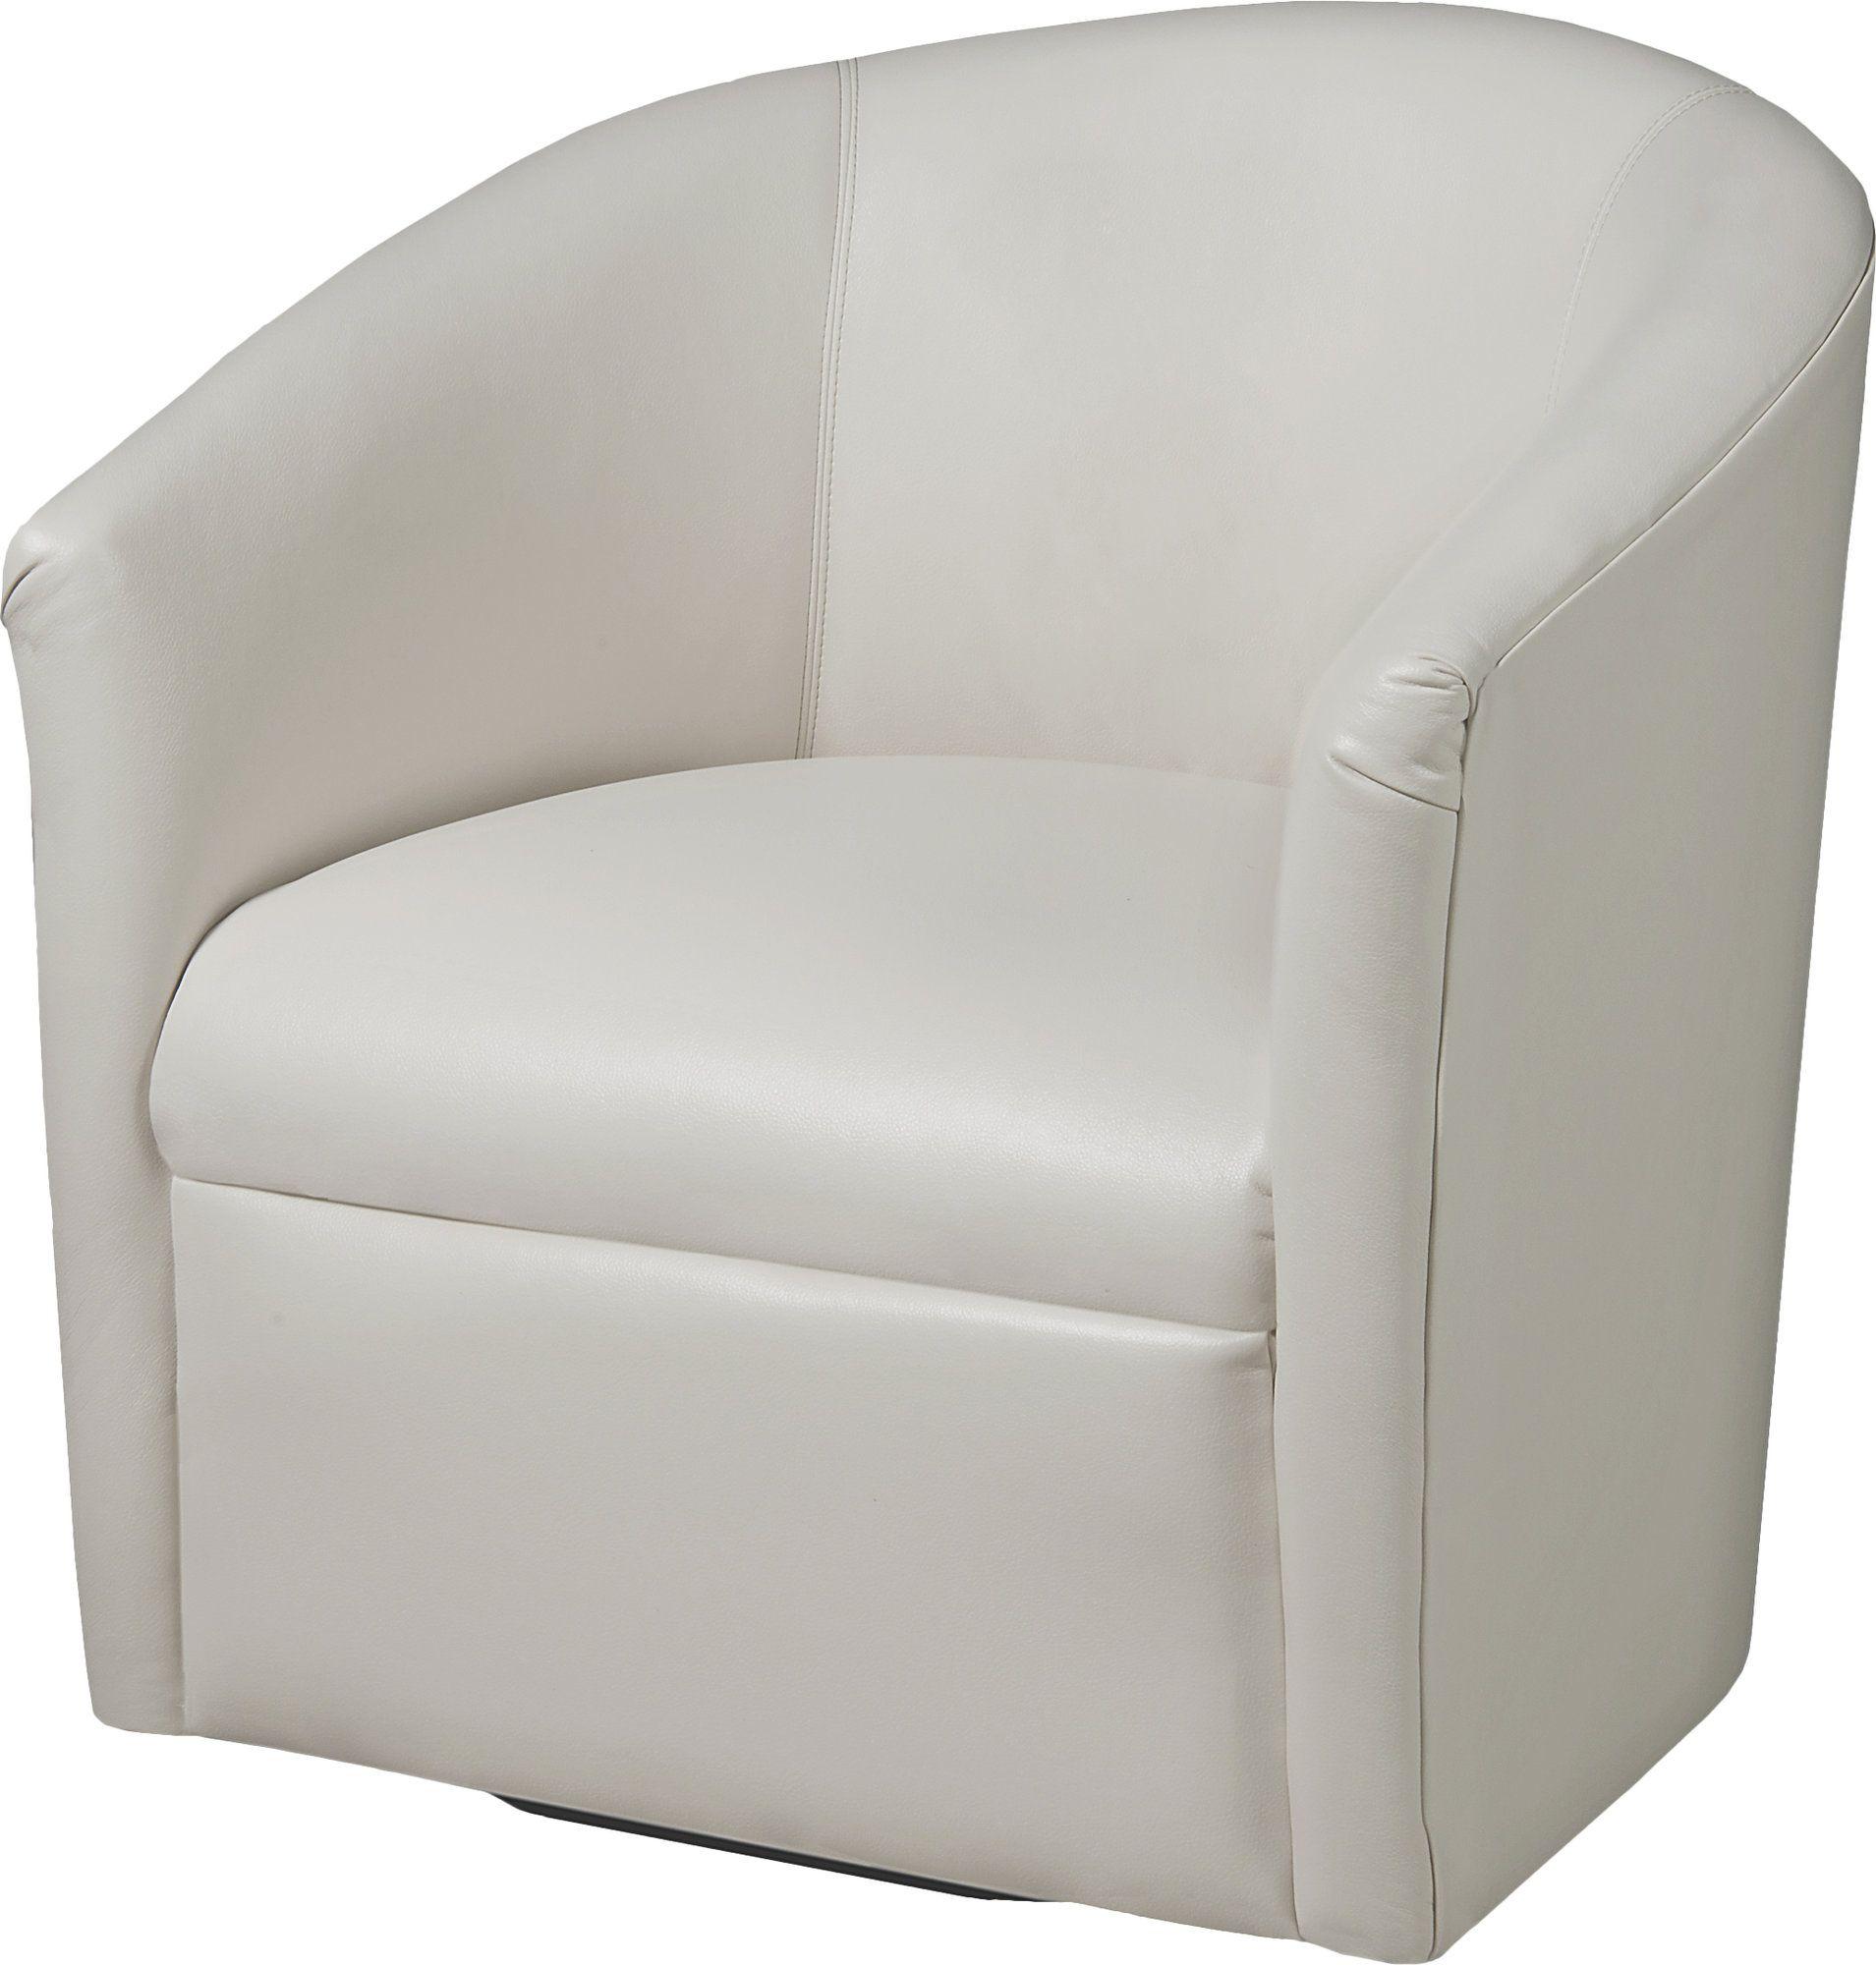 Garland Swivel Barrel Chair